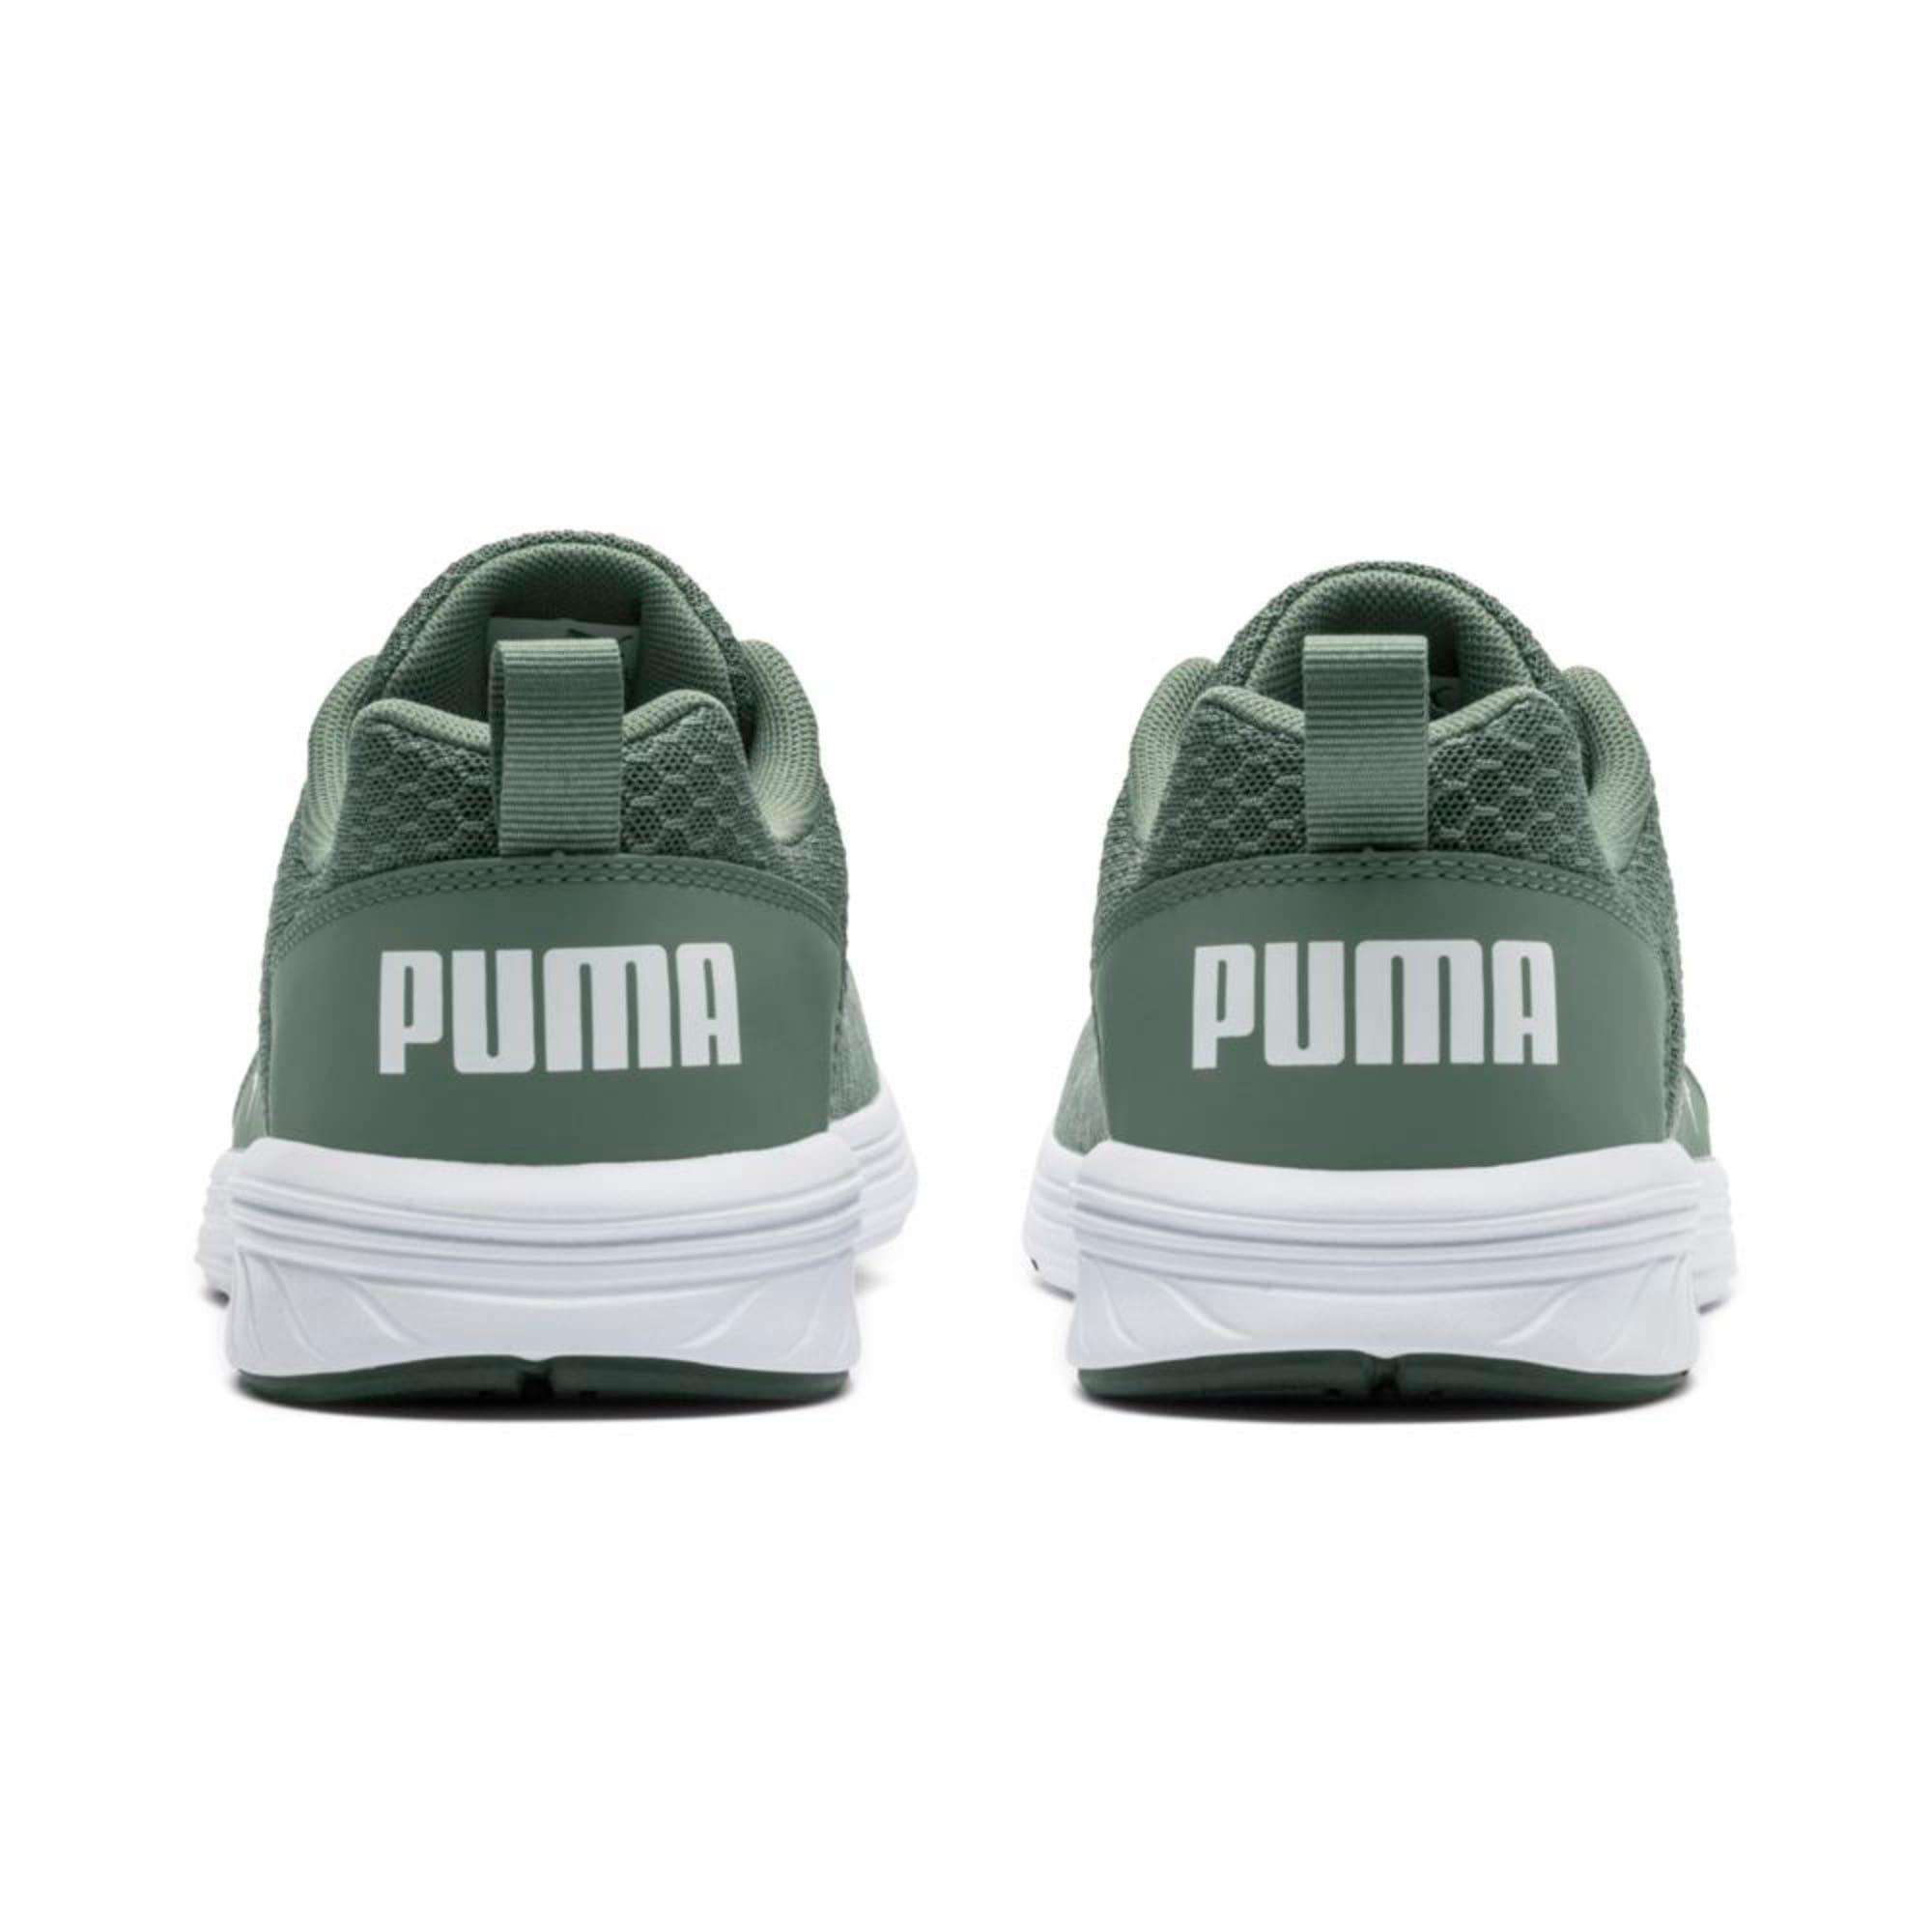 Thumbnail 4 of NRGY Comet Running Shoes, Laurel Wreath-Puma White, medium-IND